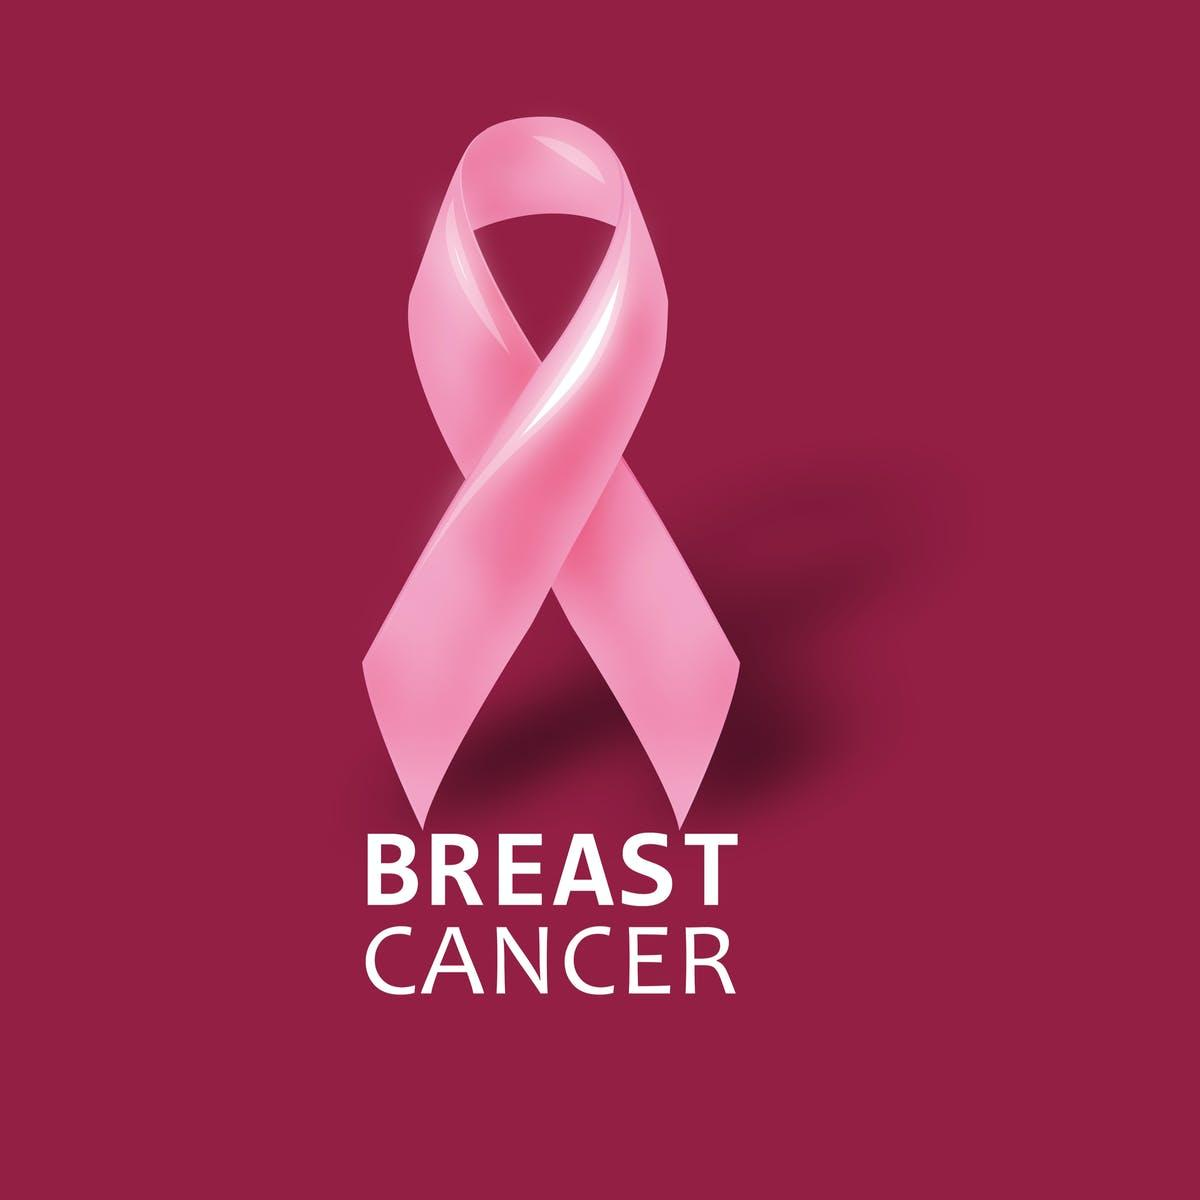 food to avoid in breast cancer, breast cancer diet ichhori.webp